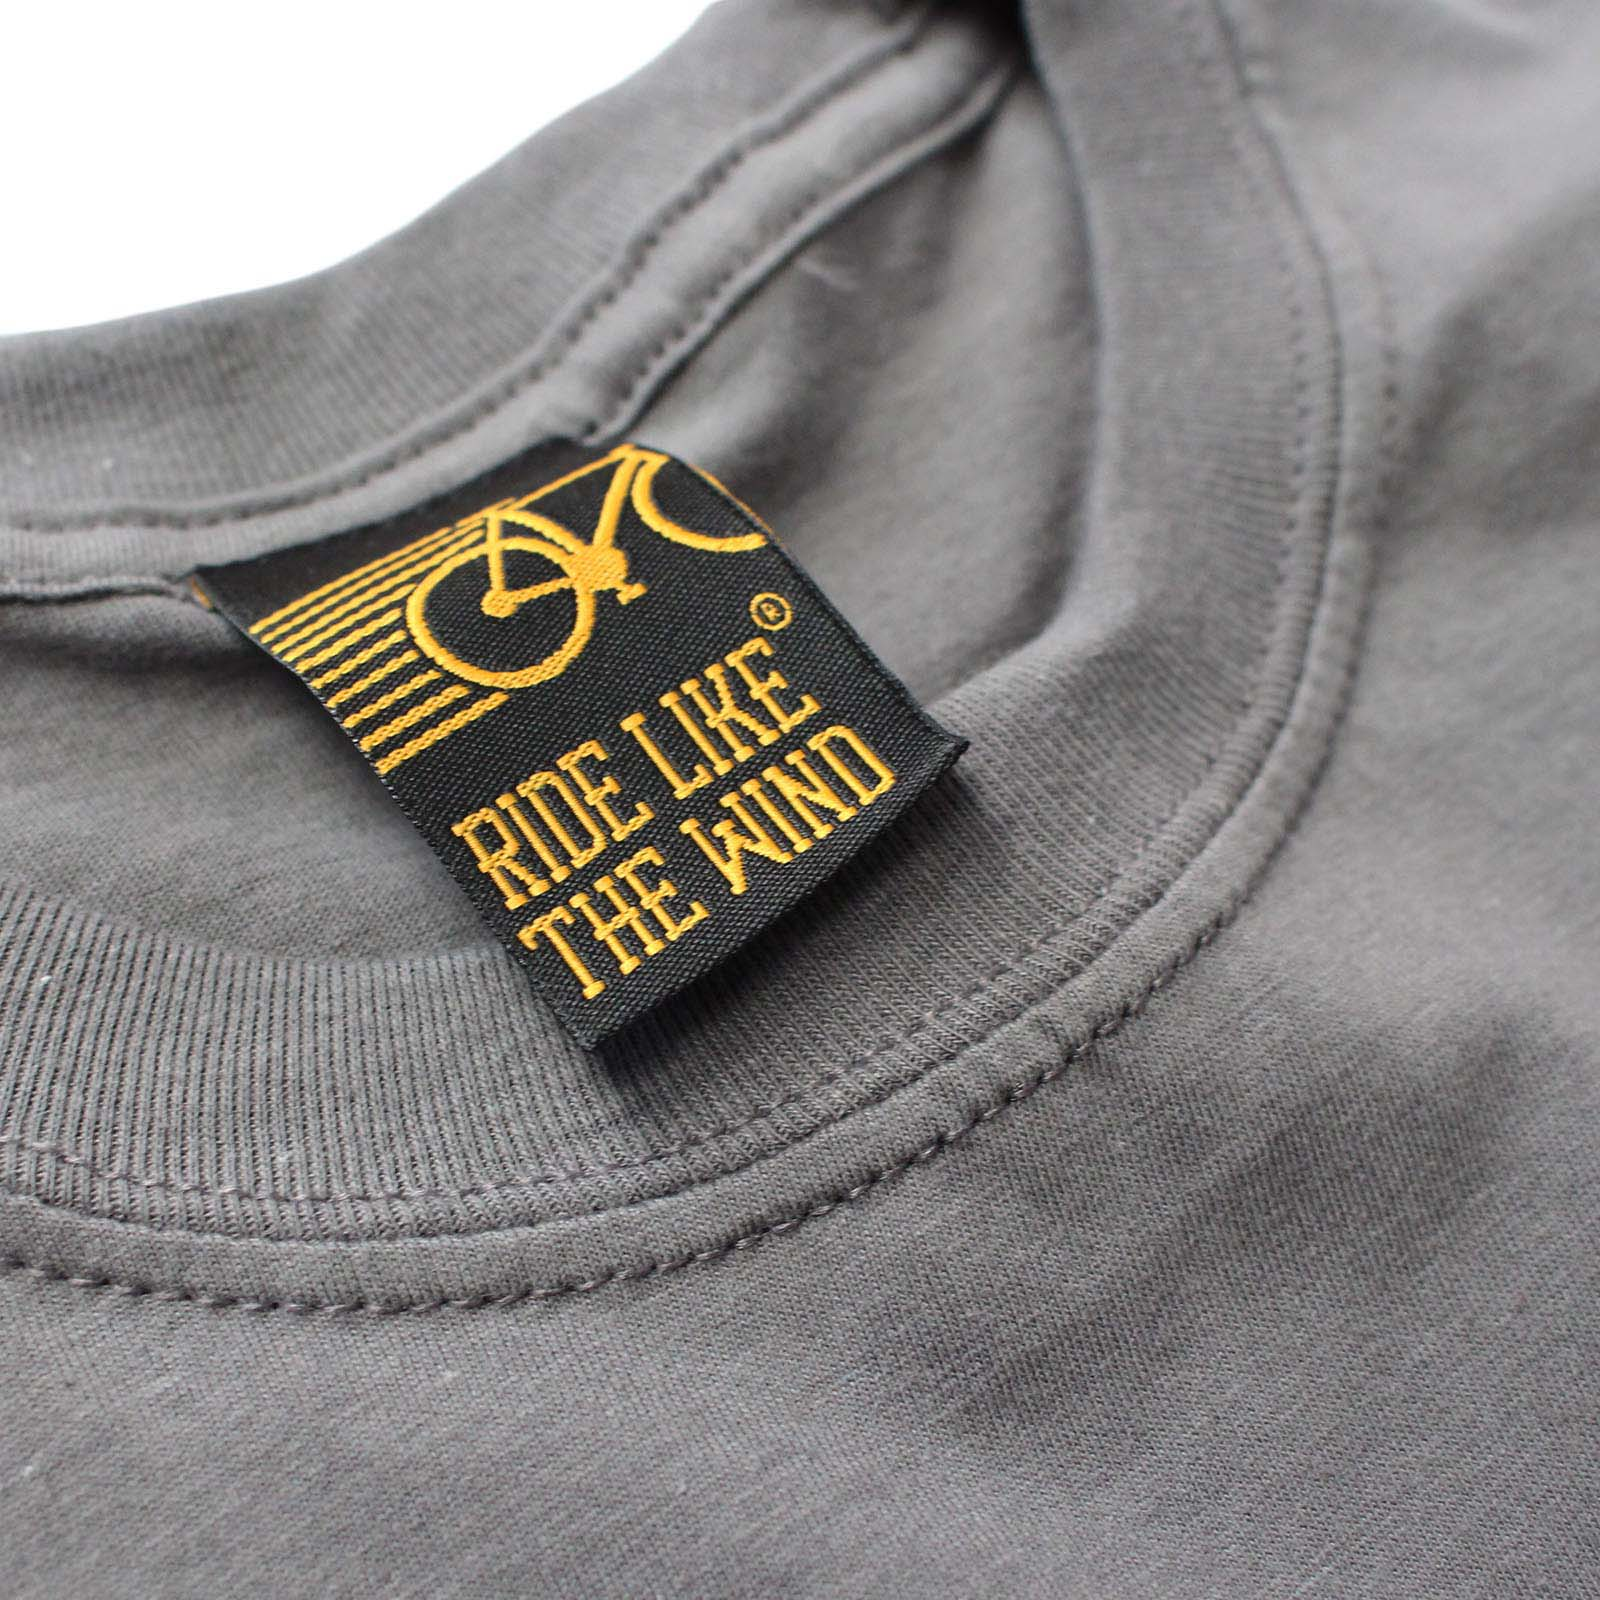 Cycling-Yeah-My-Bike-Did-Cost-More-funny-top-Birthday-tee-T-SHIRT-T-SHIRT thumbnail 8